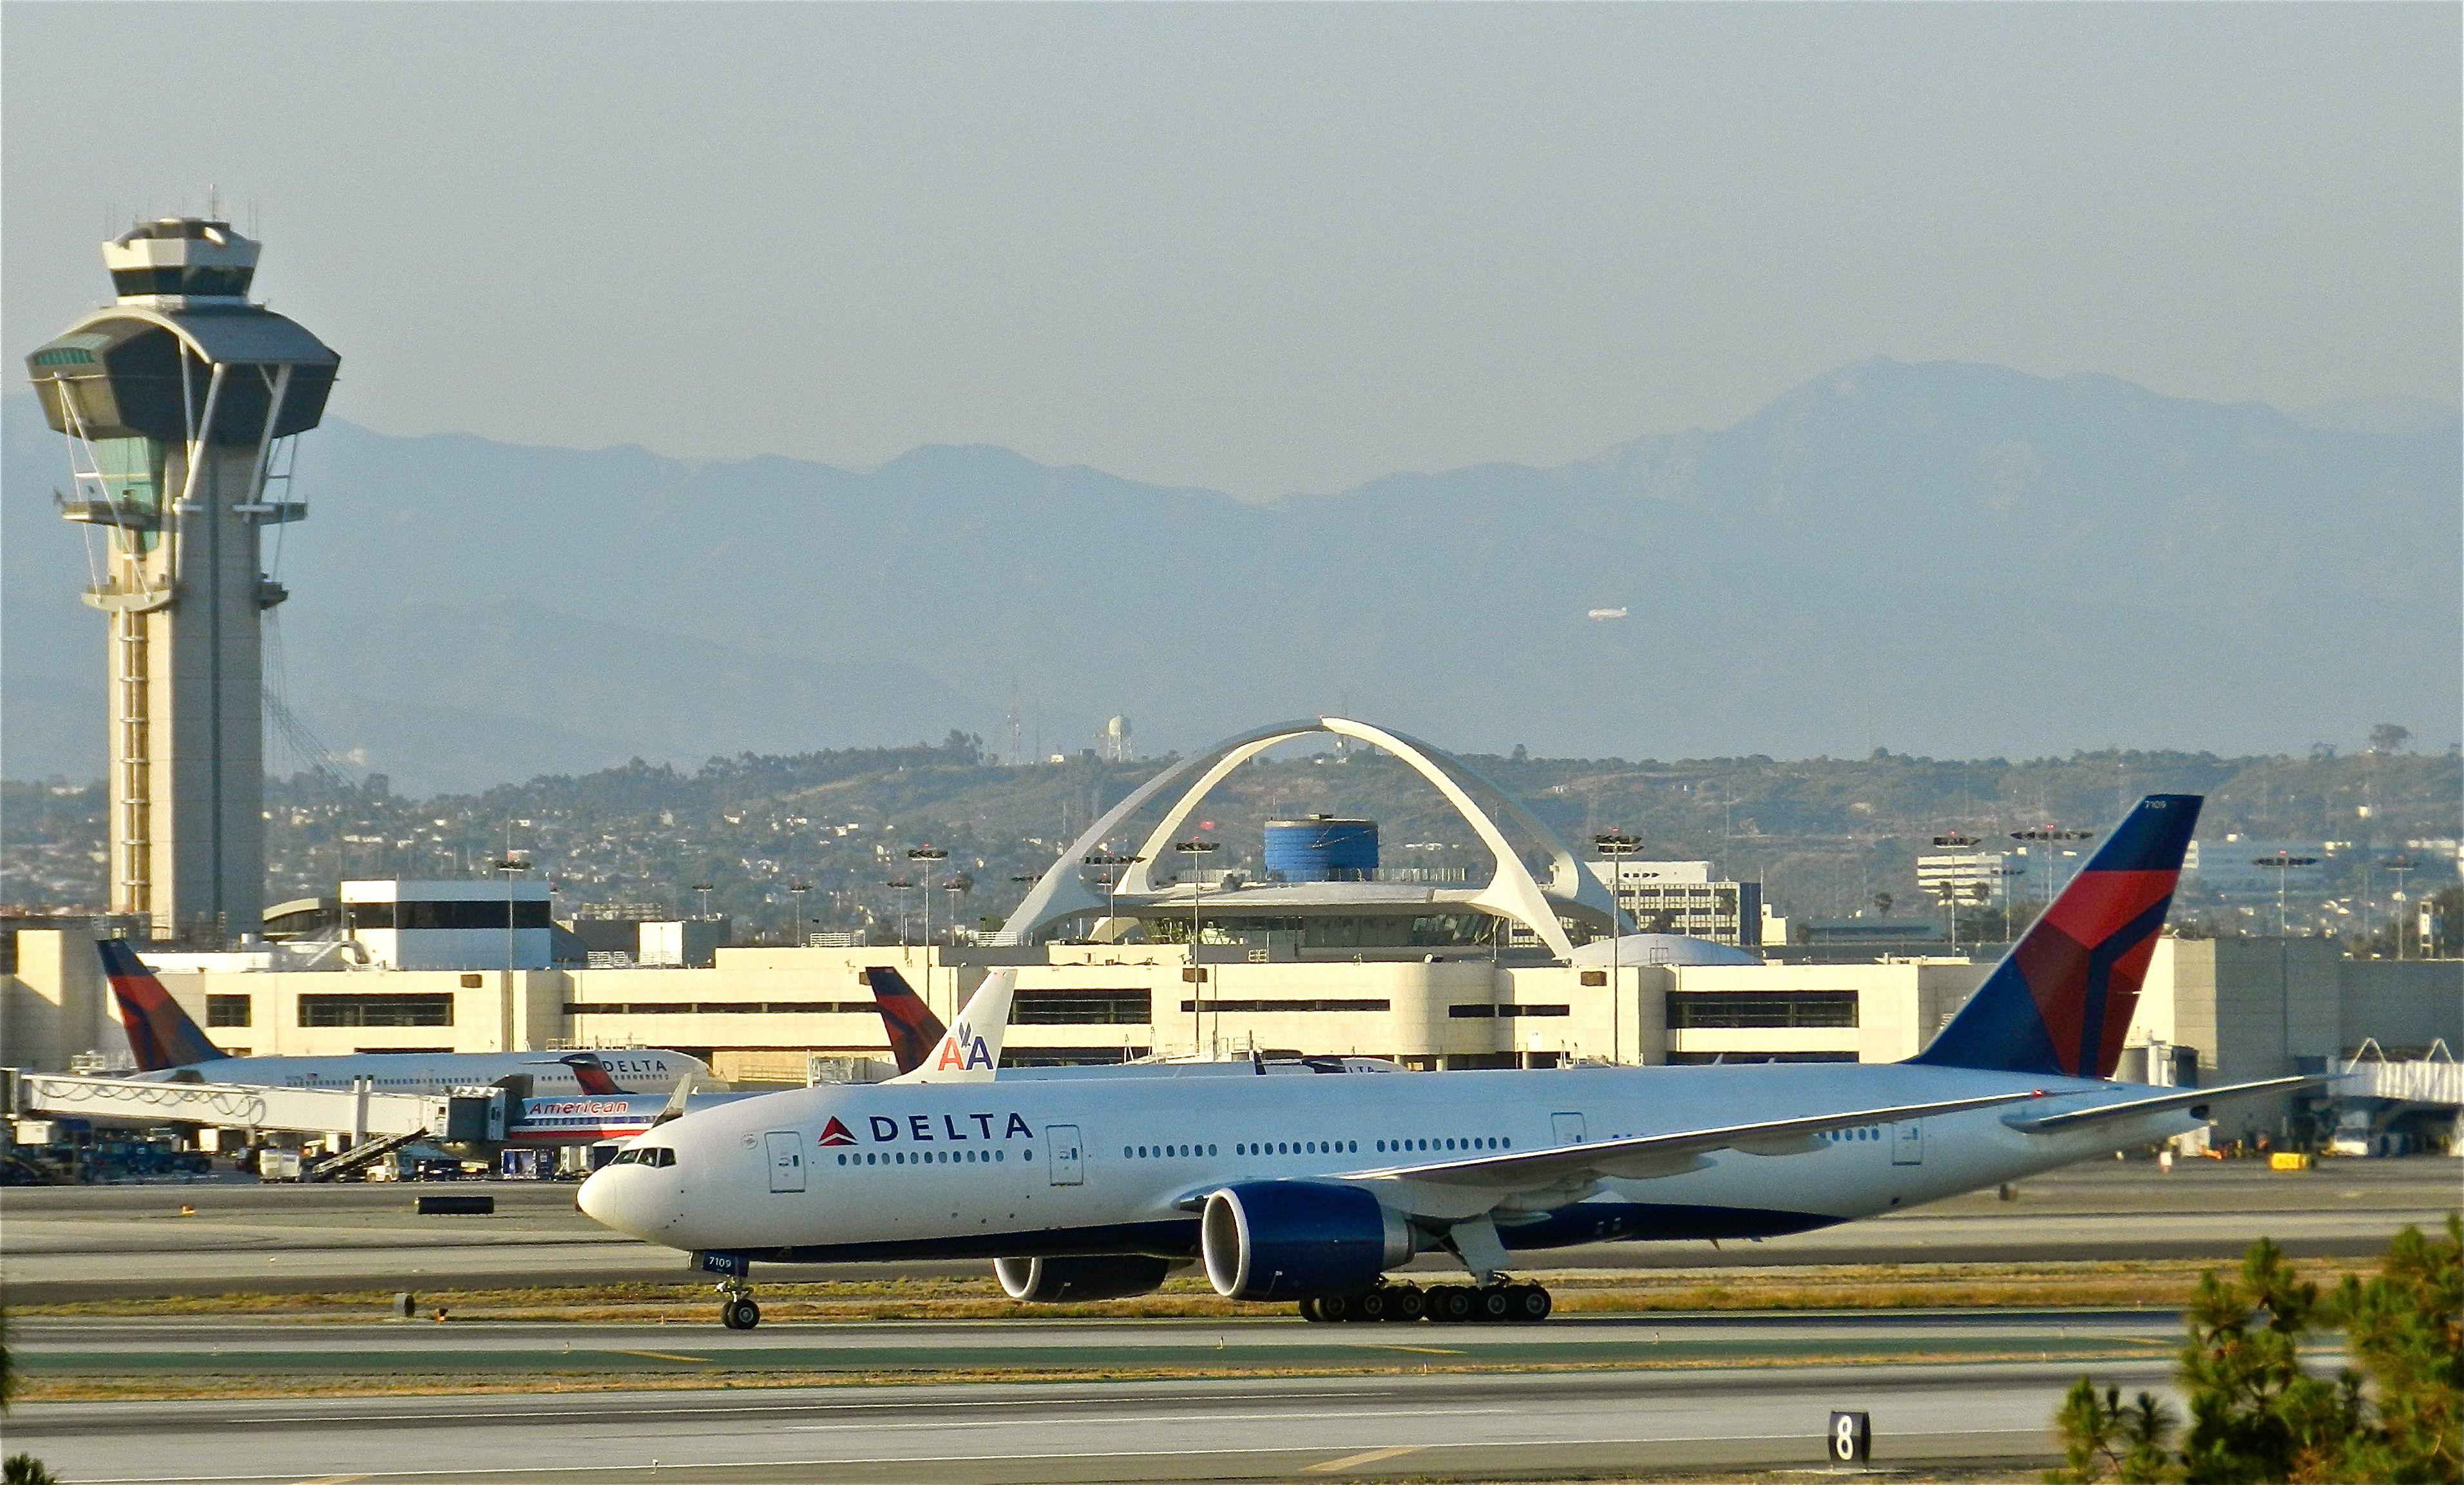 DELTA 777 at LAX Delta airlines, Vintage aircraft